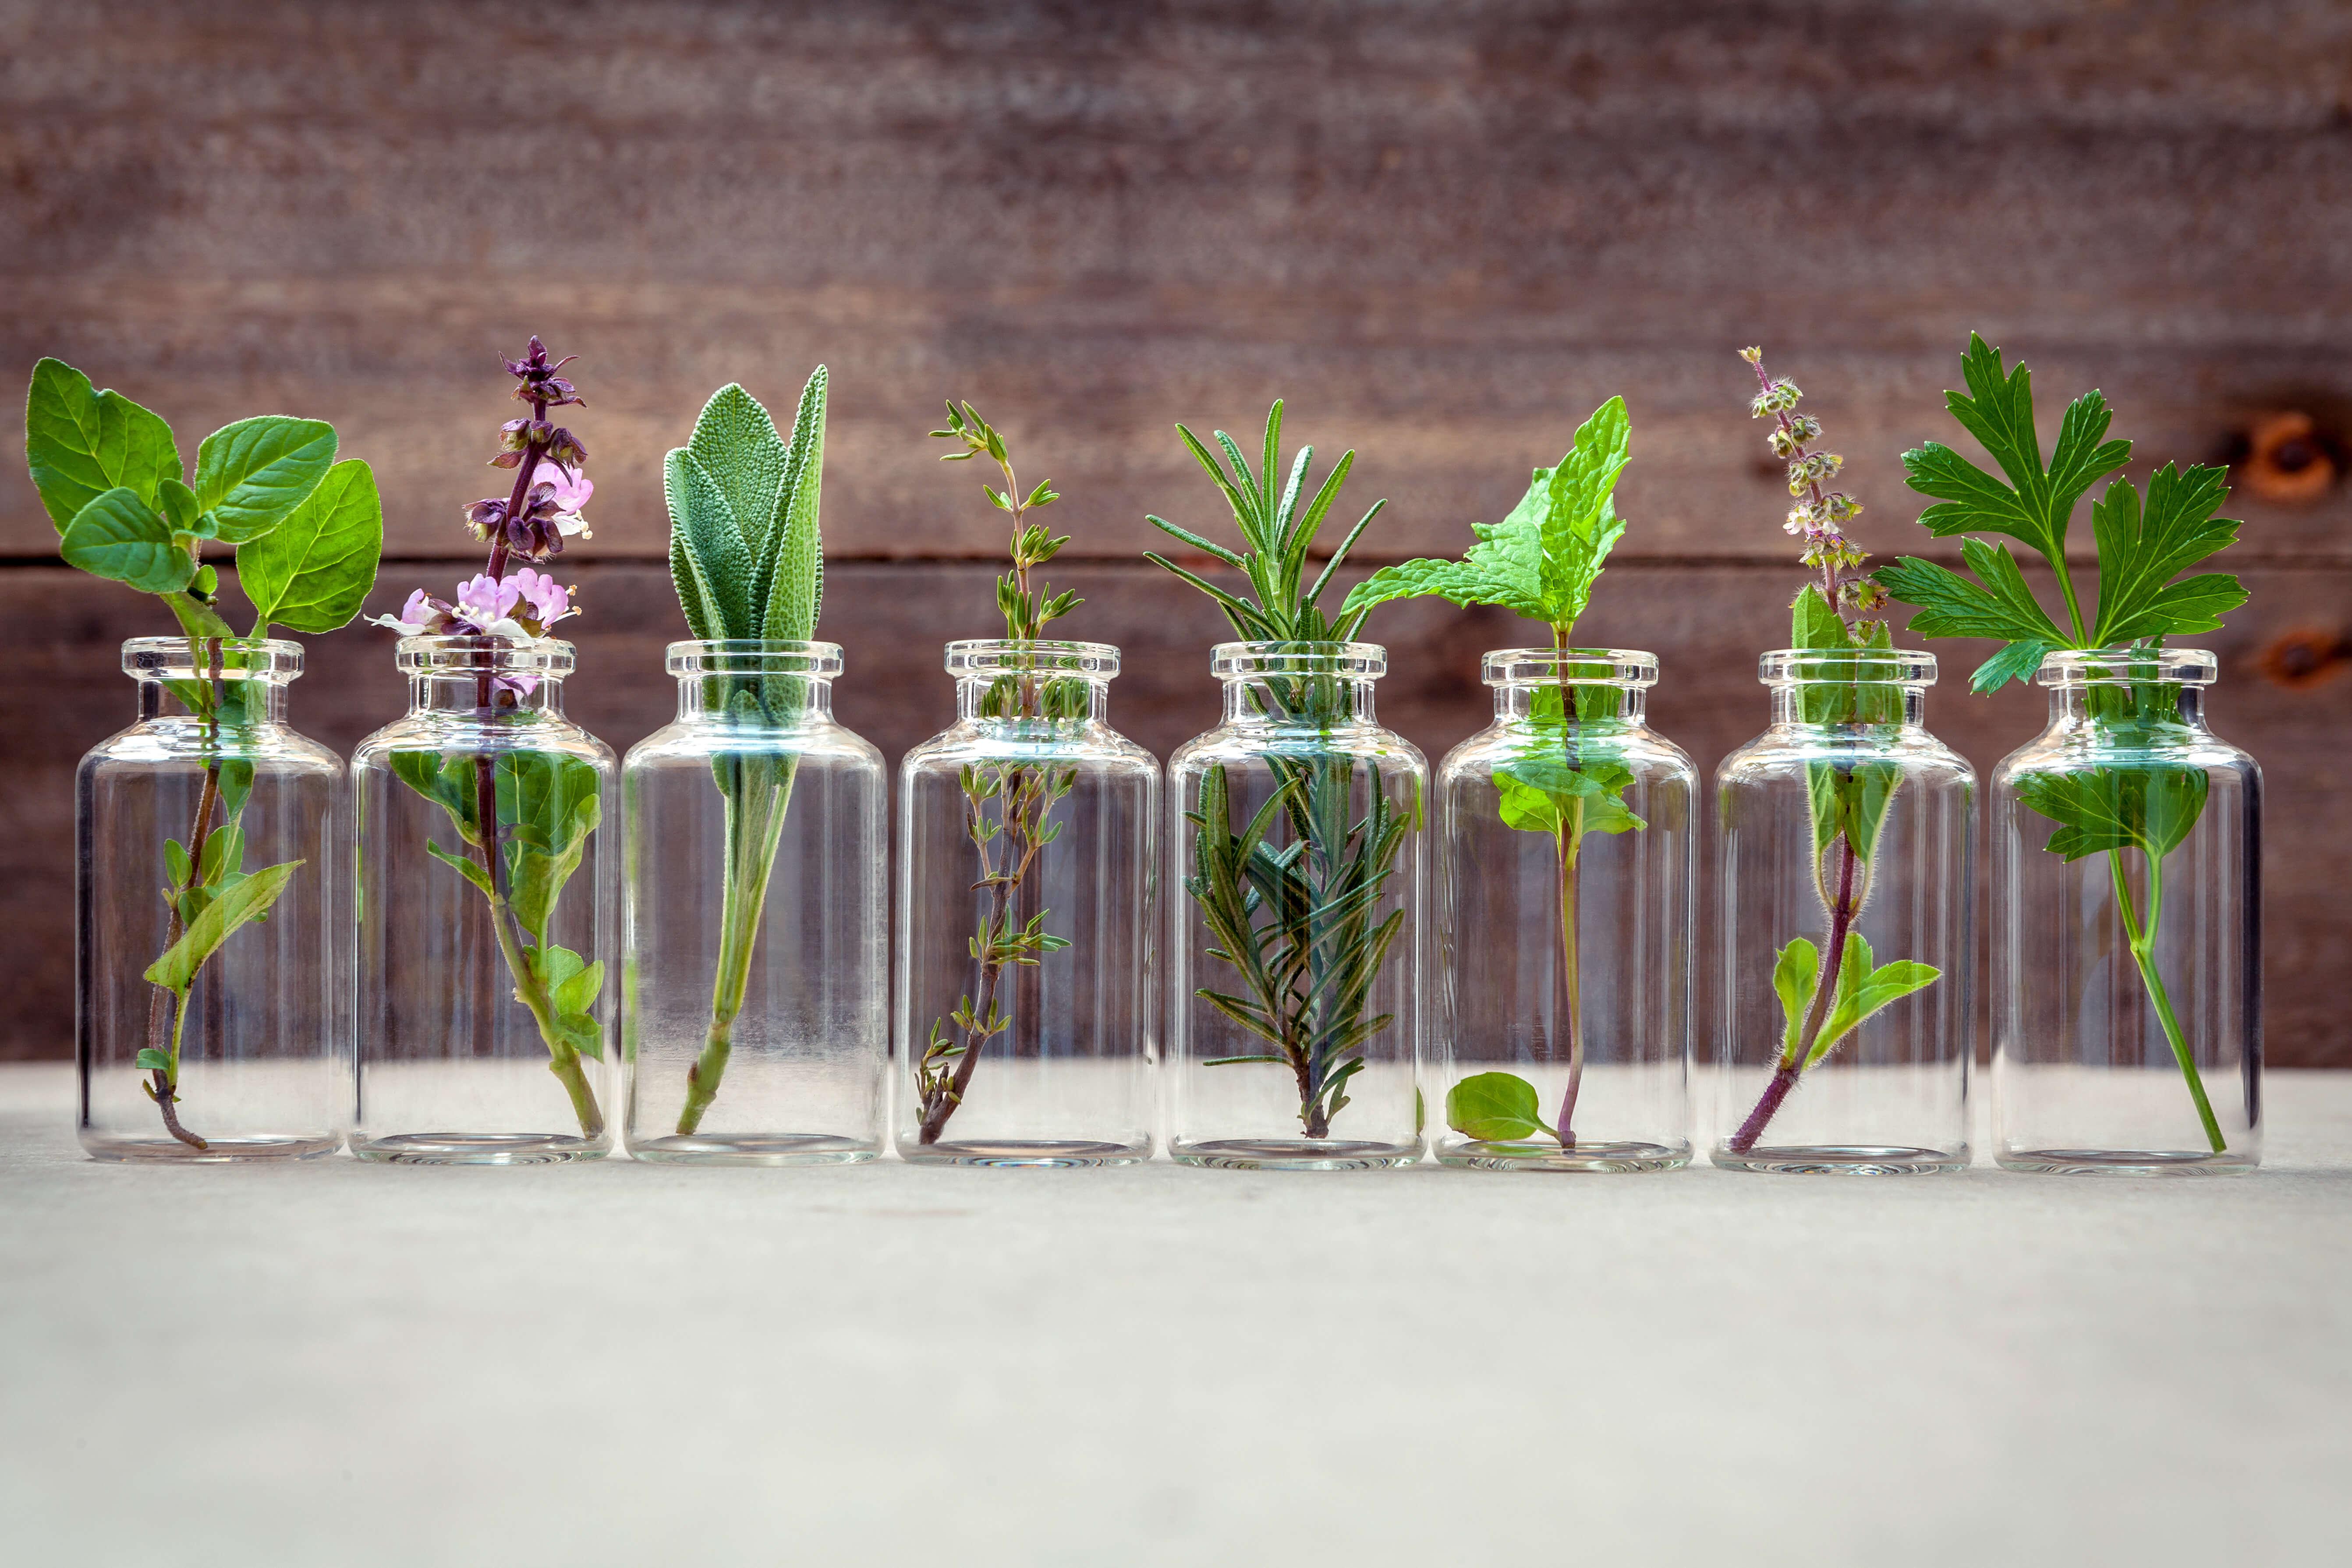 Lipid Pneumonia and Essential Oils? Should I be Concerned?